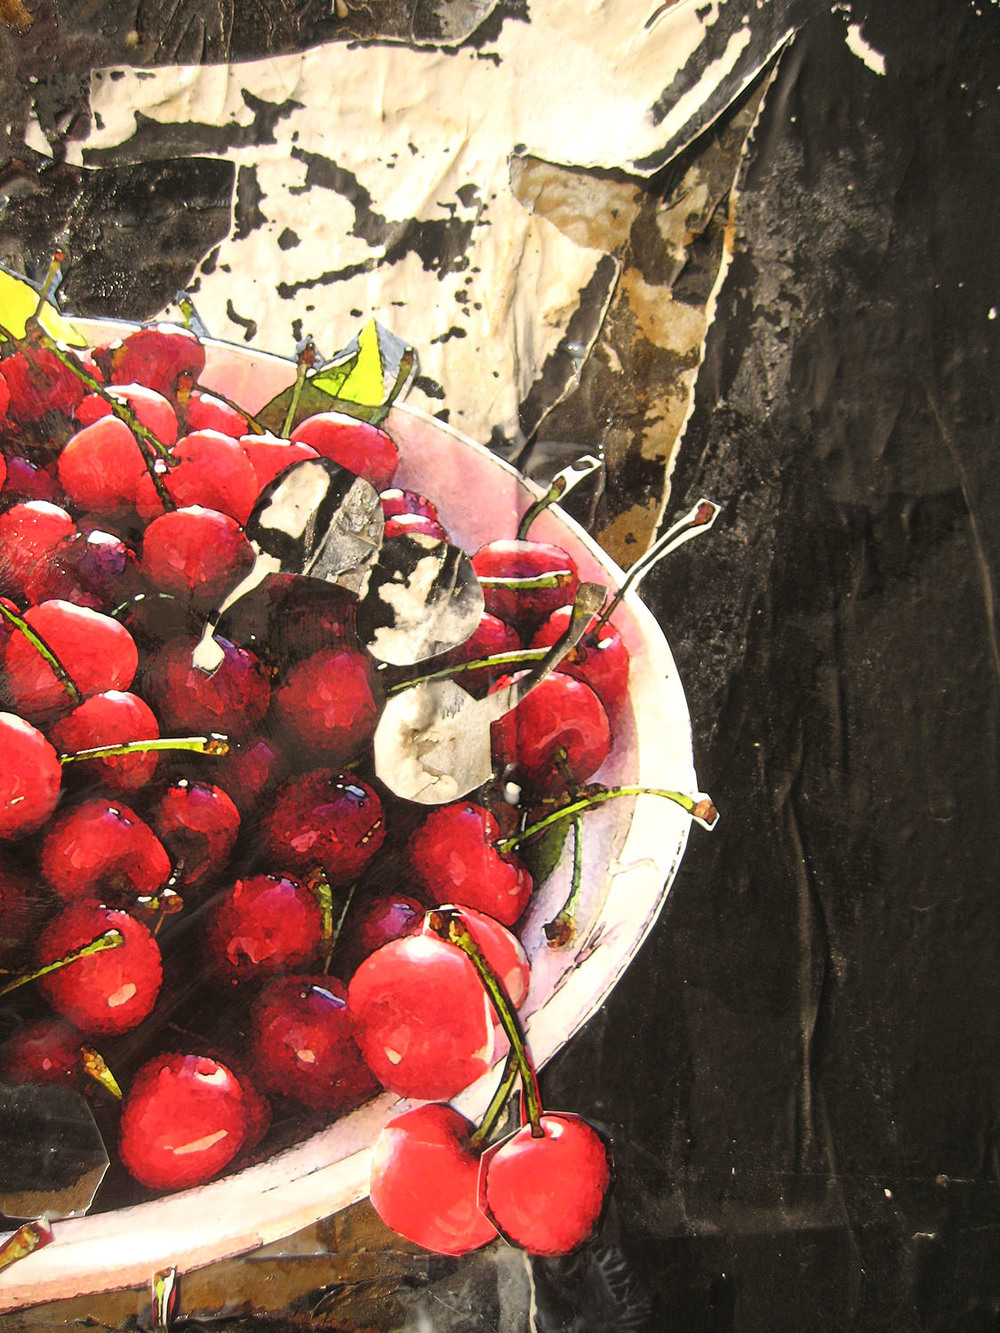 Bowl of Cherries on Howard St. (detail), NYC